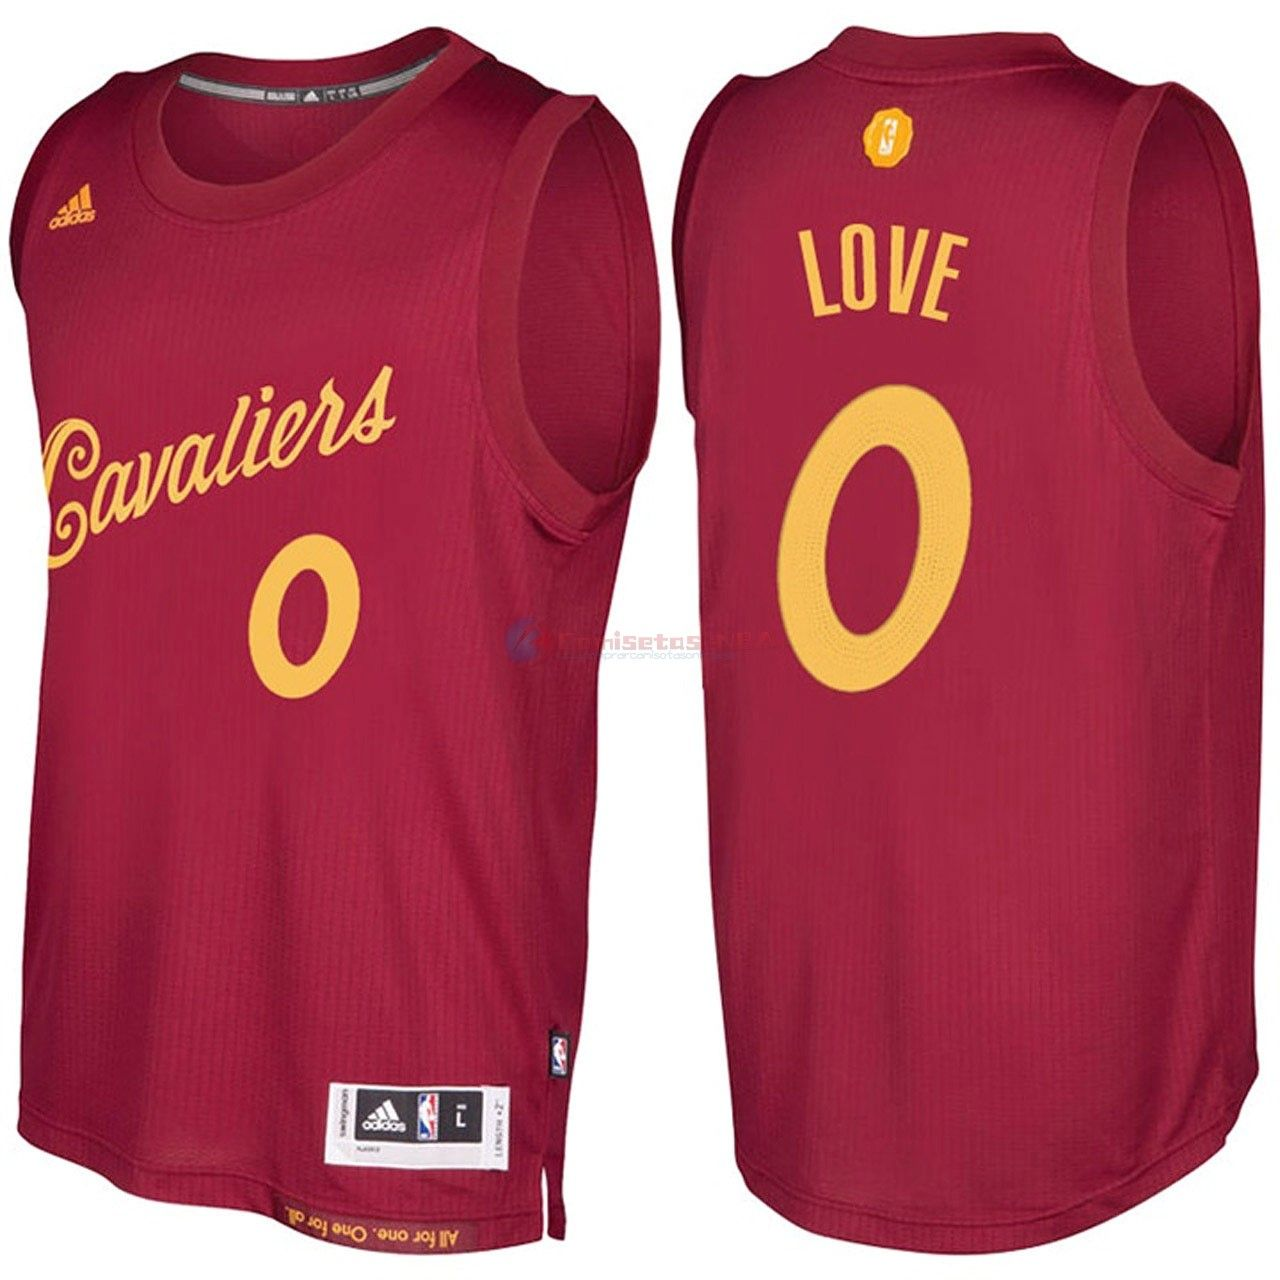 a2315e26984 Camisetas NBA Cleveland Cavaliers 0 Kevin Love Rojo Hardwood Classics 2016-17  - Hasta Un